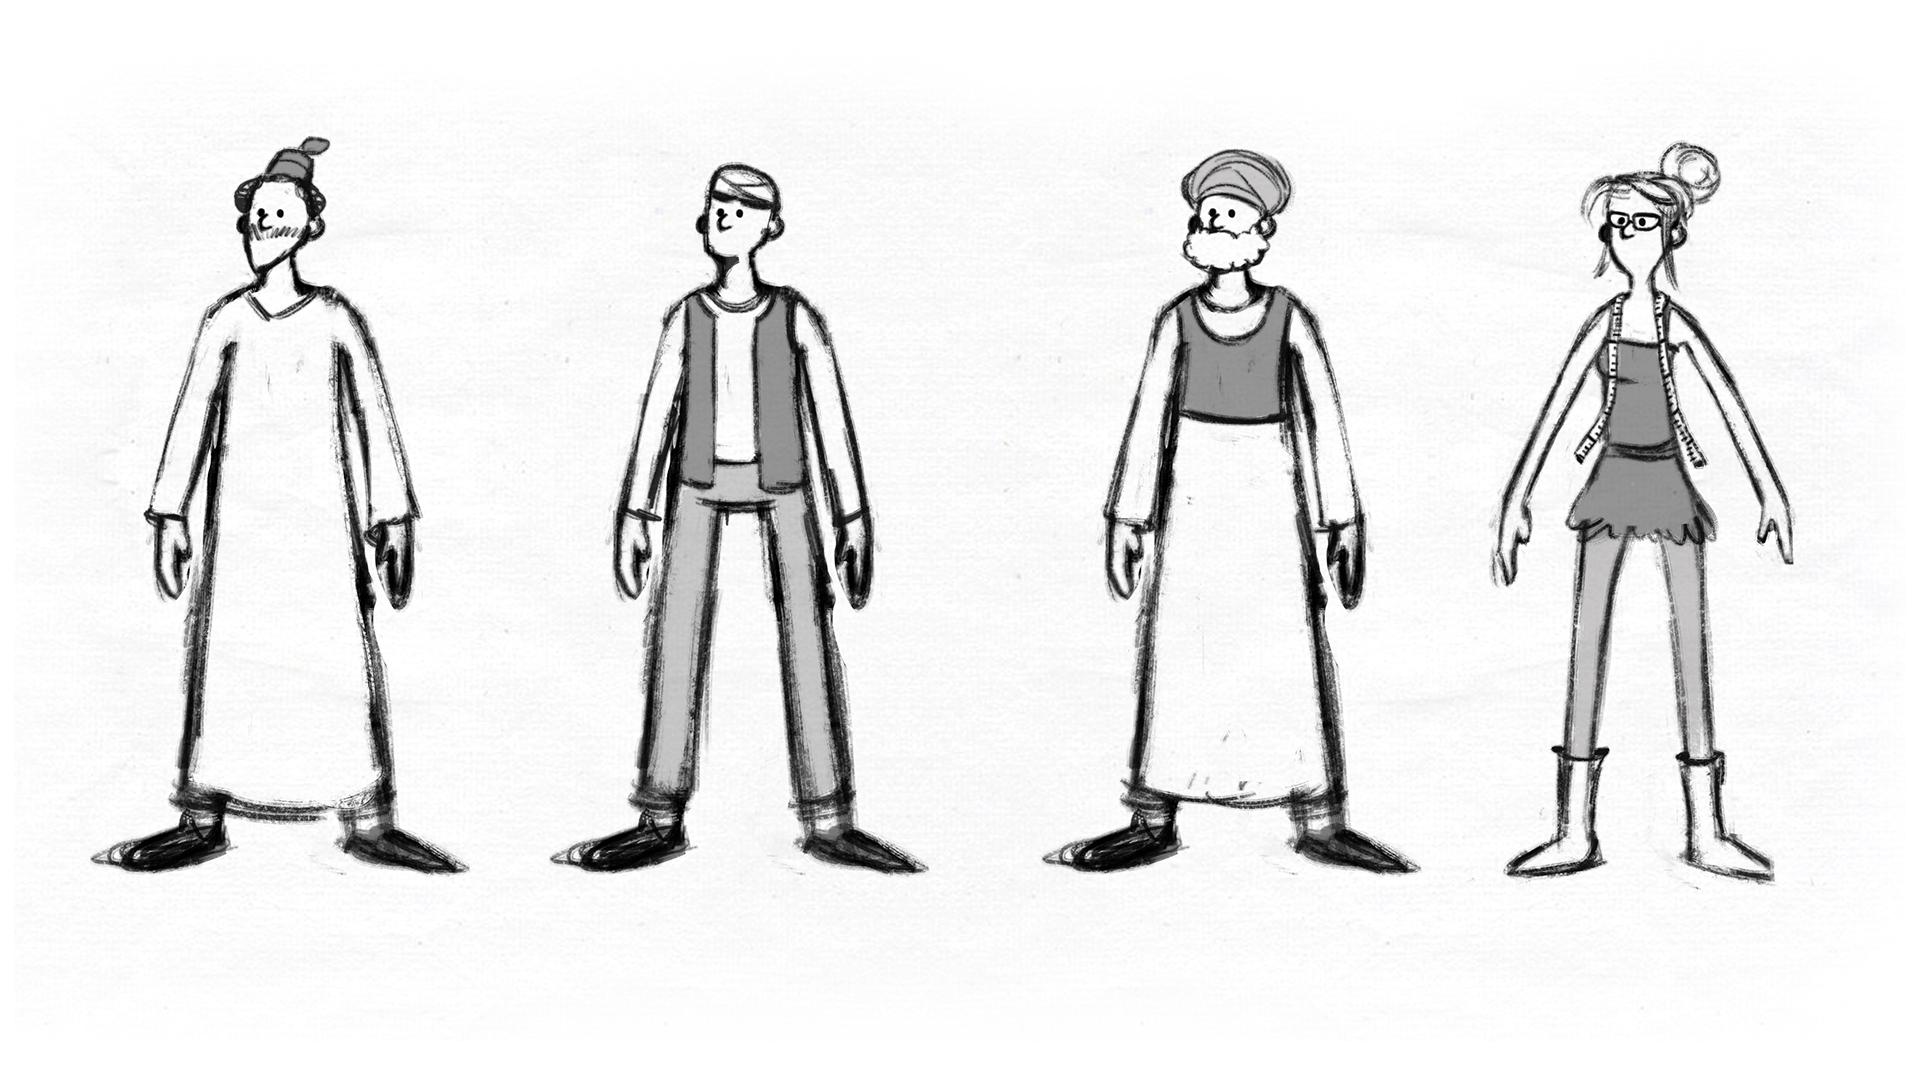 Paypal_Calabash_Design_Fashion_Sketches.jpg